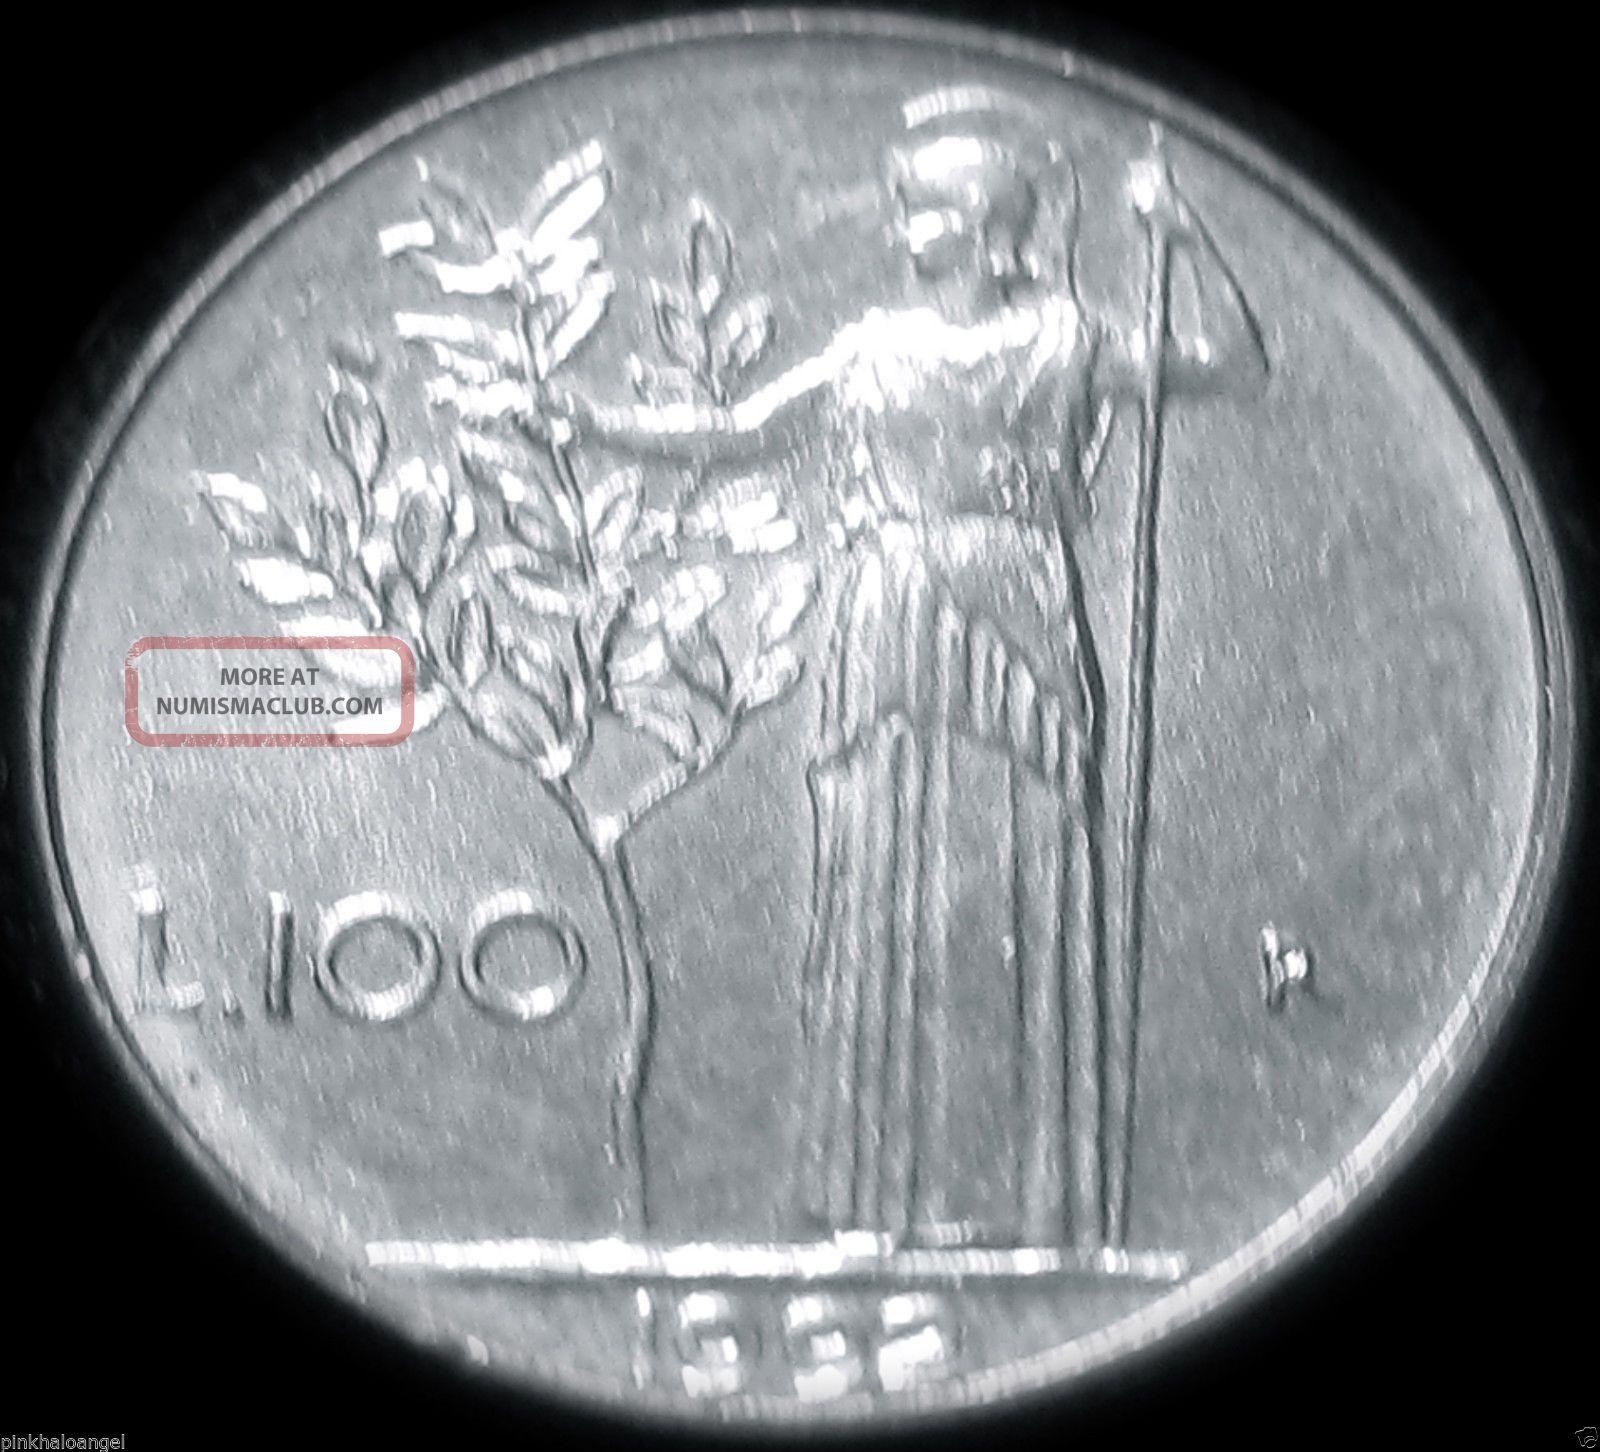 Athena Coin - Italy - ' Mini - Me ' 100 Lire - Great Coin Rare Combine S&h Italy, San Marino, Vatican photo